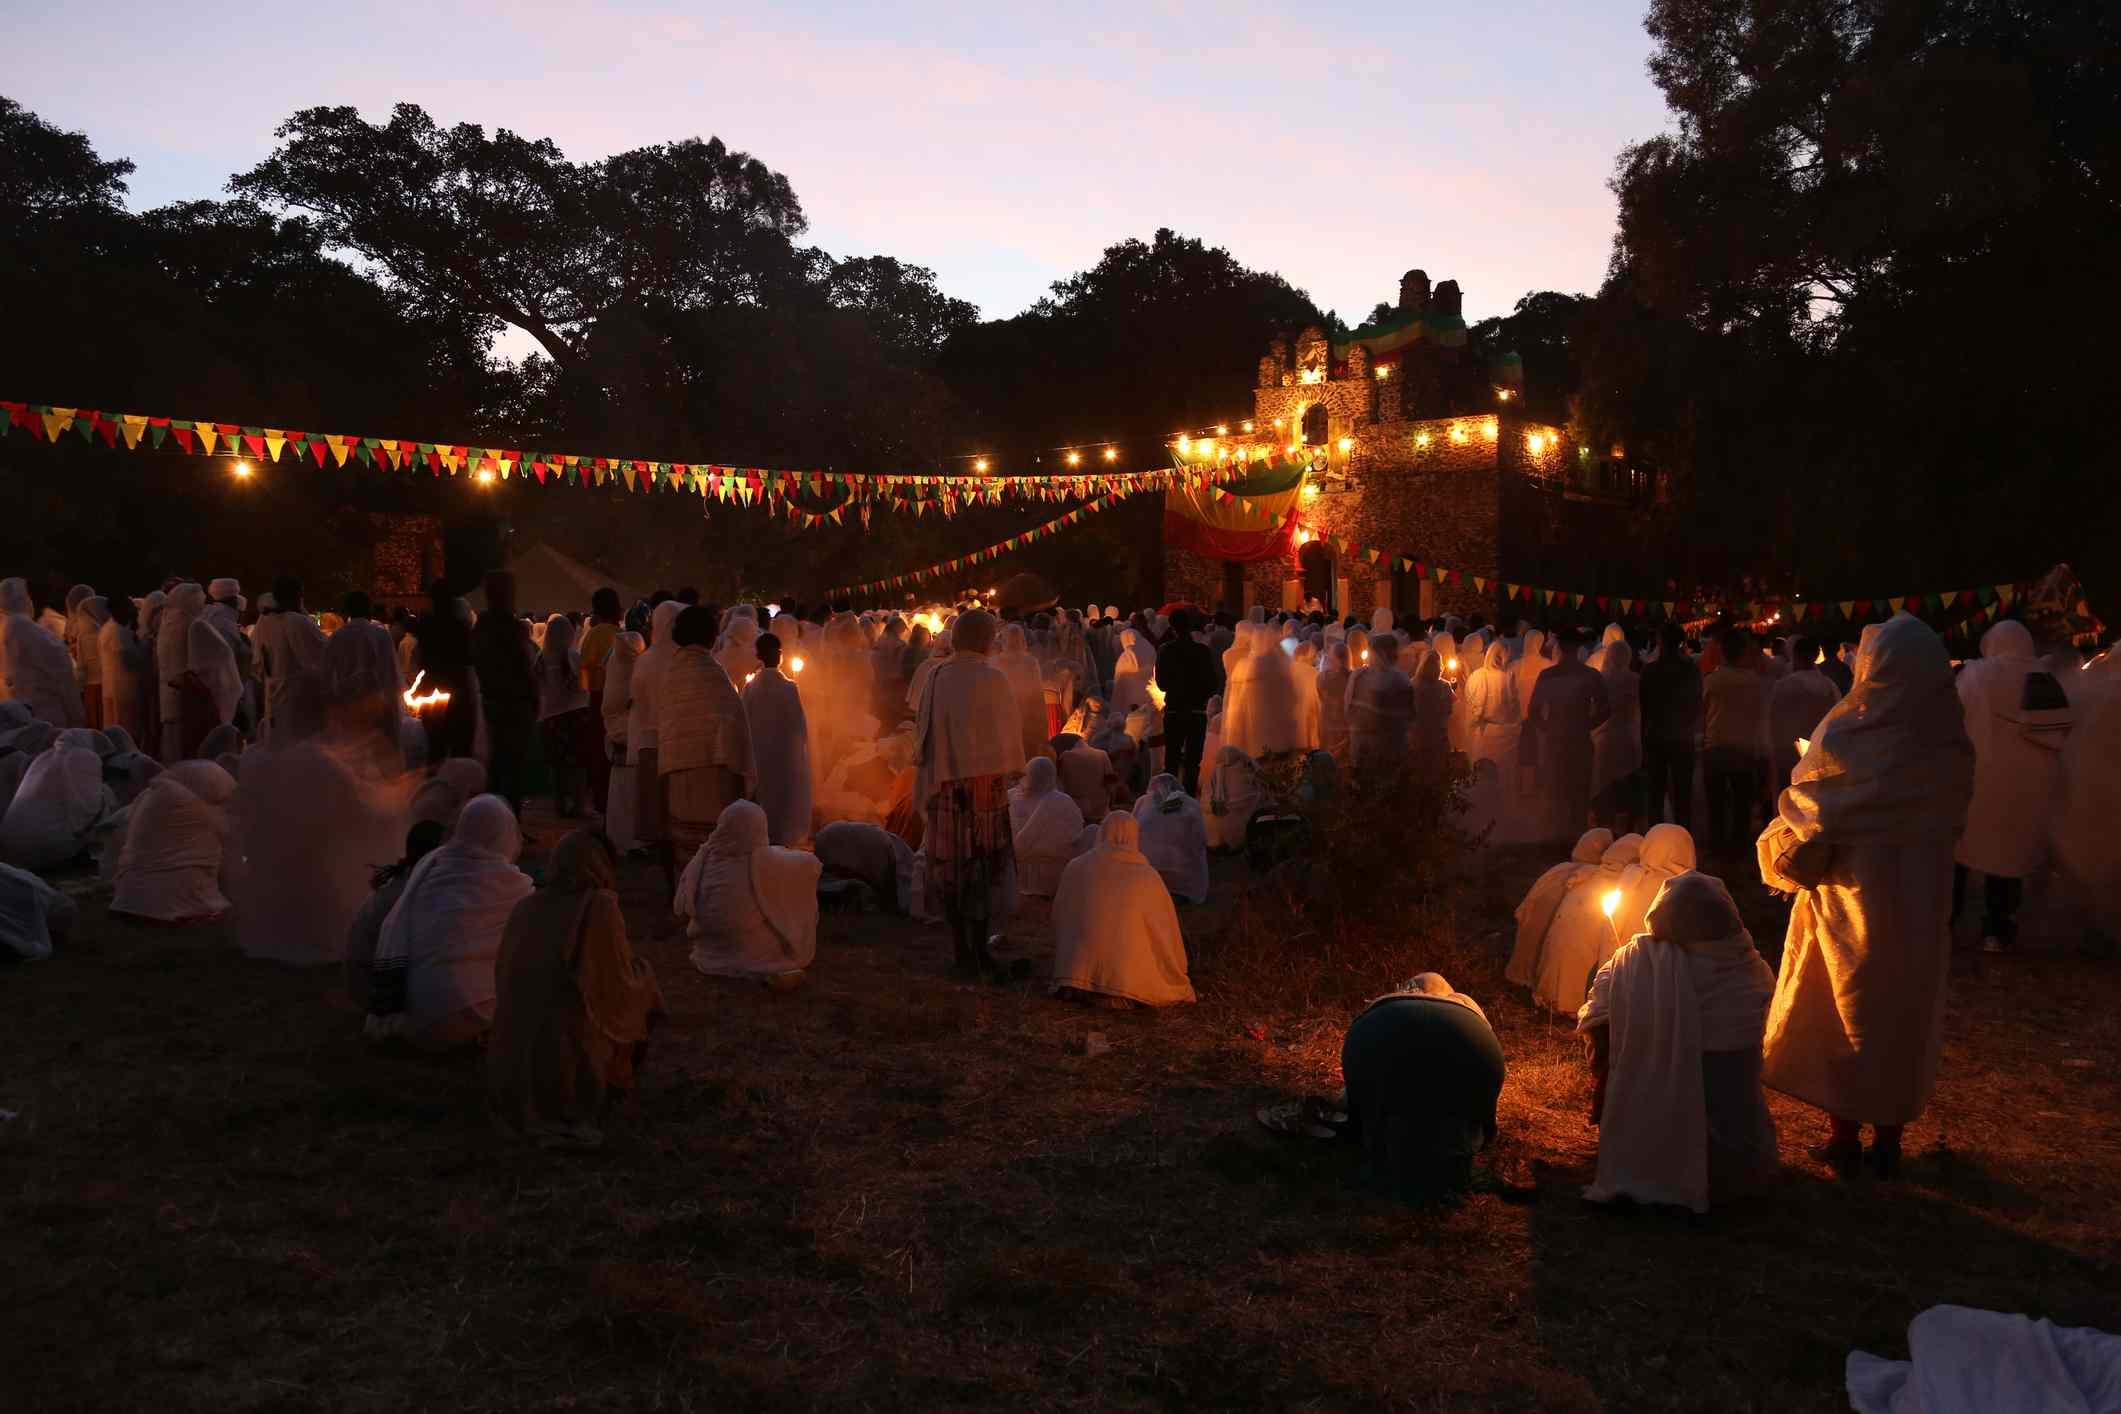 Christians hold a candlelit vigil during the Timket festival in Gondar